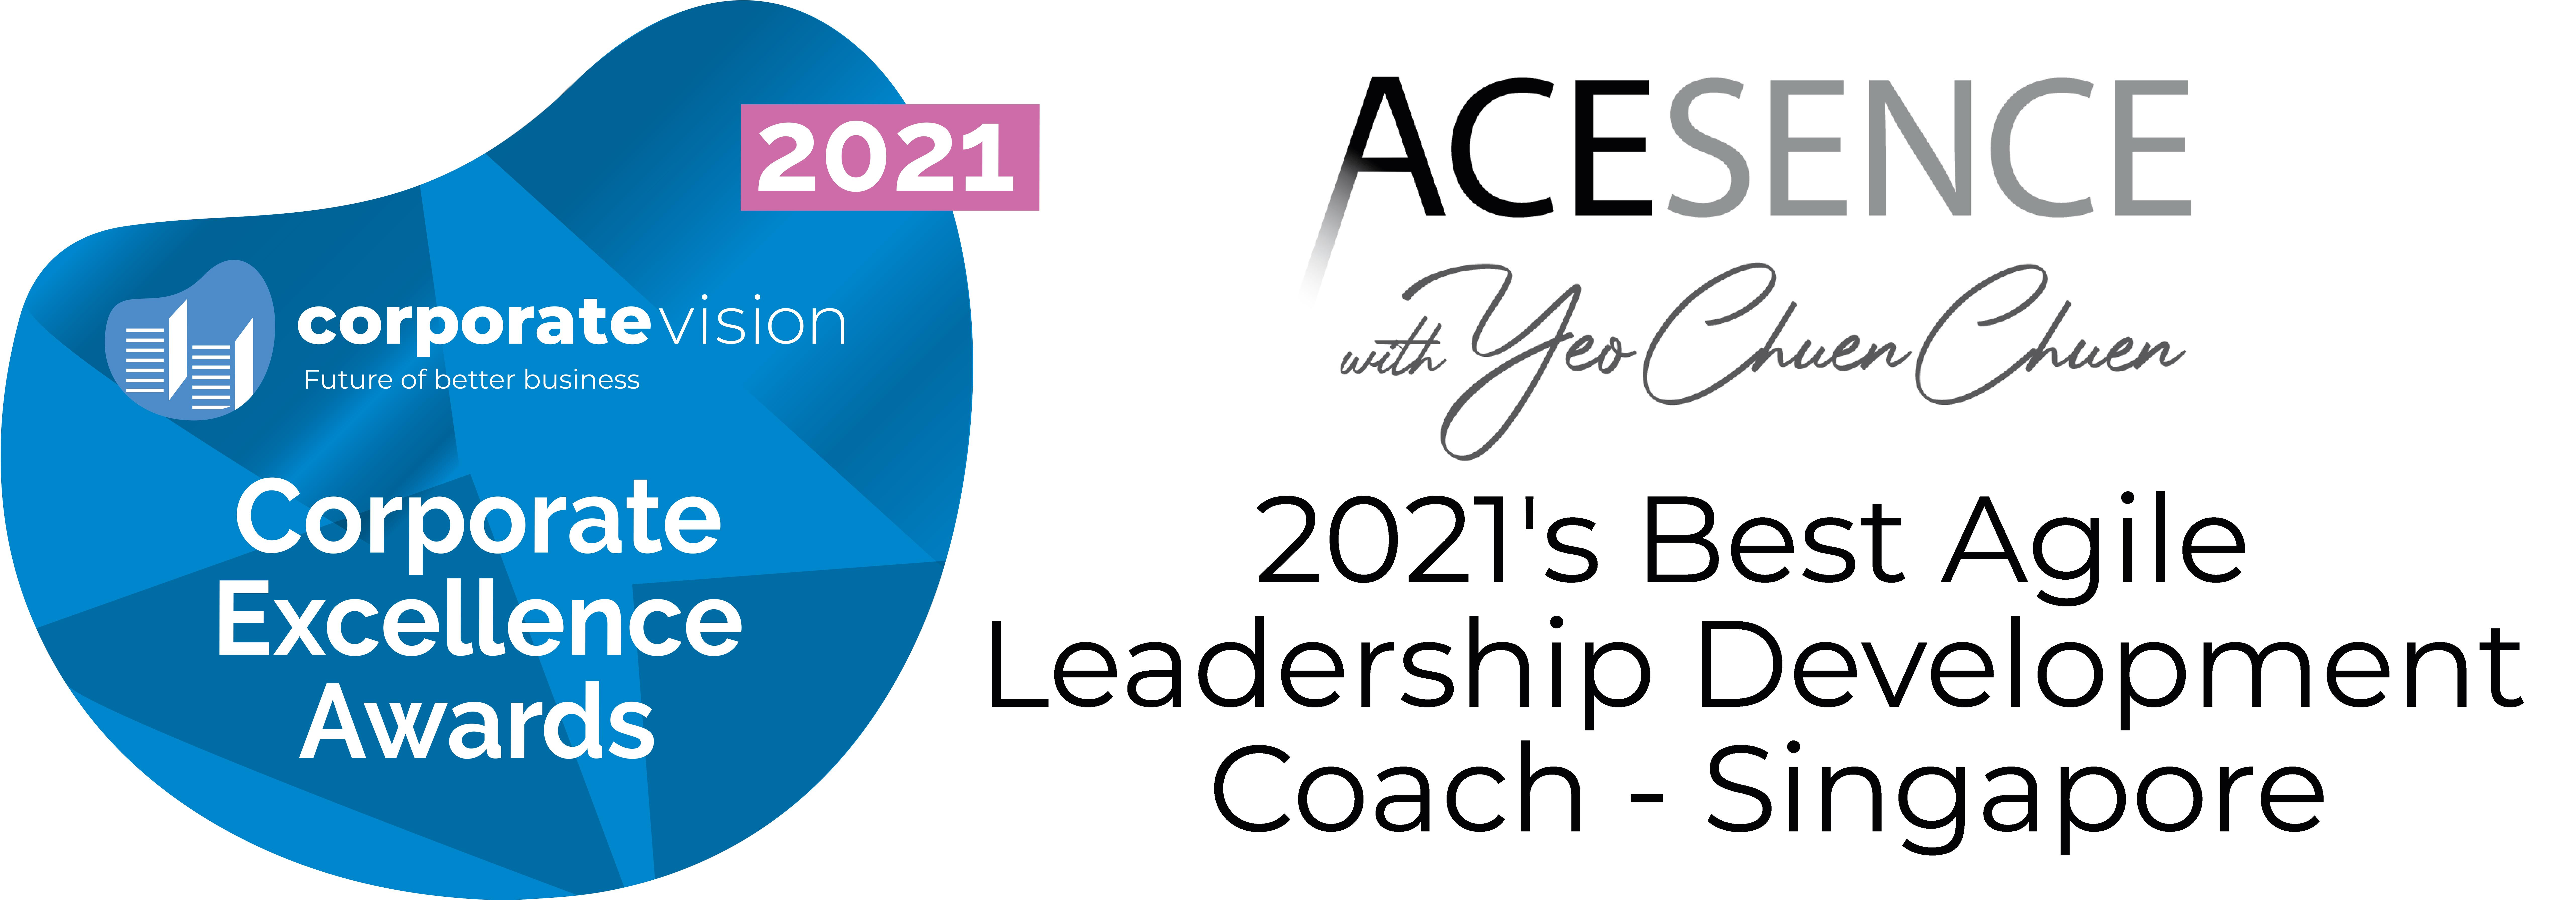 best agile leadership coach 2021